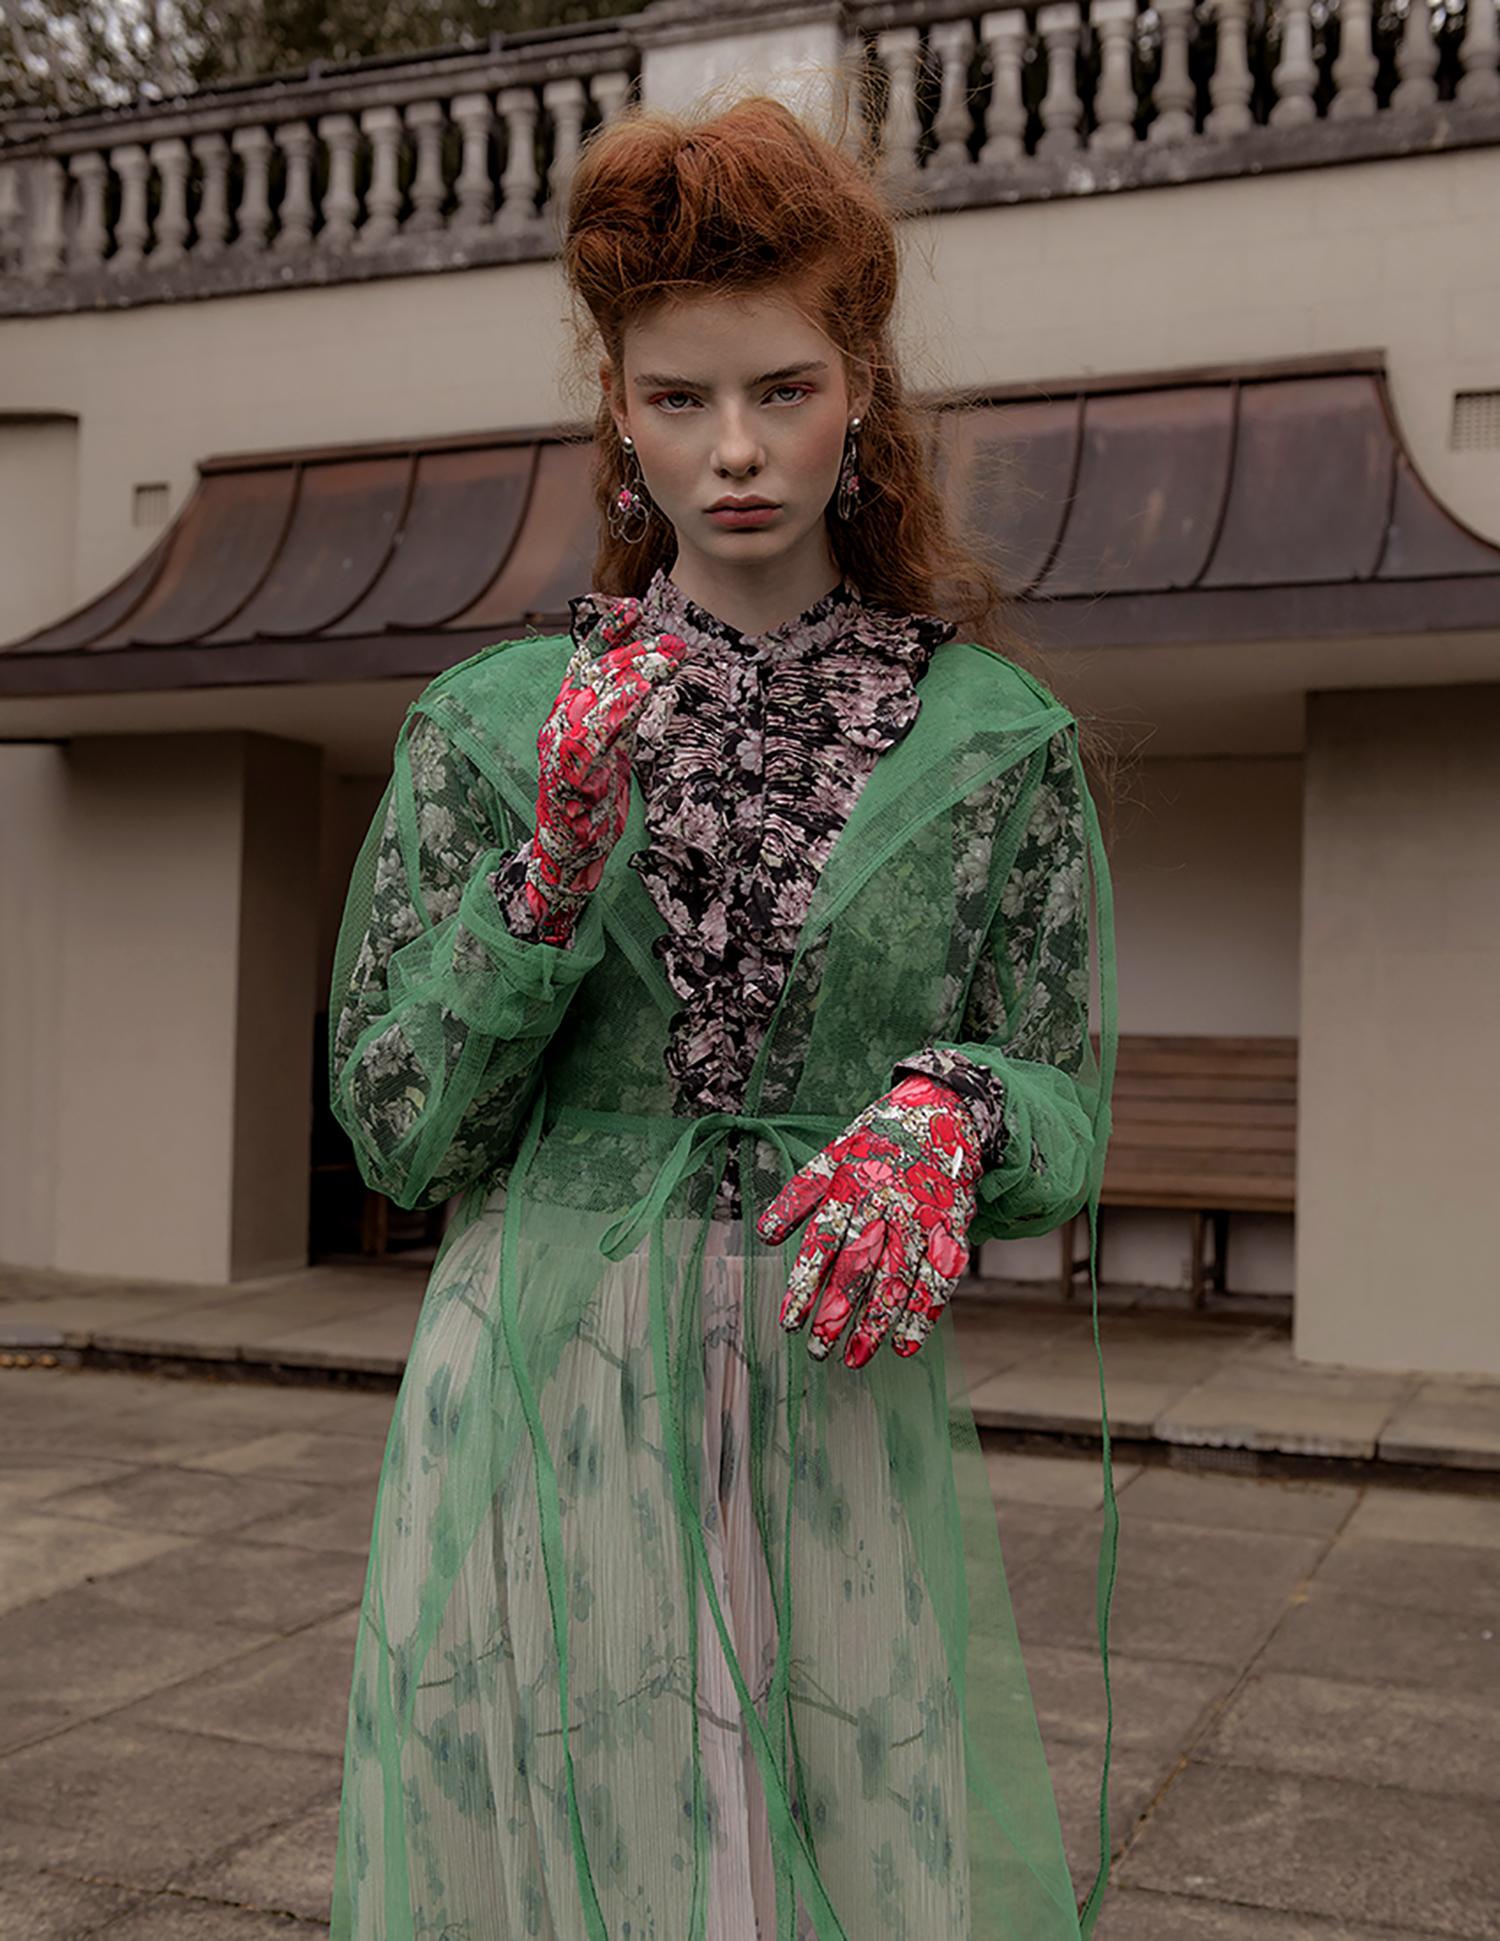 Aretes  CAR|2I E, abrigo  Shiori Suzuki , Shirt by H&M, guantes   PRTTYBOI LDN , falda  TOPSHOP , botas  ASOS .